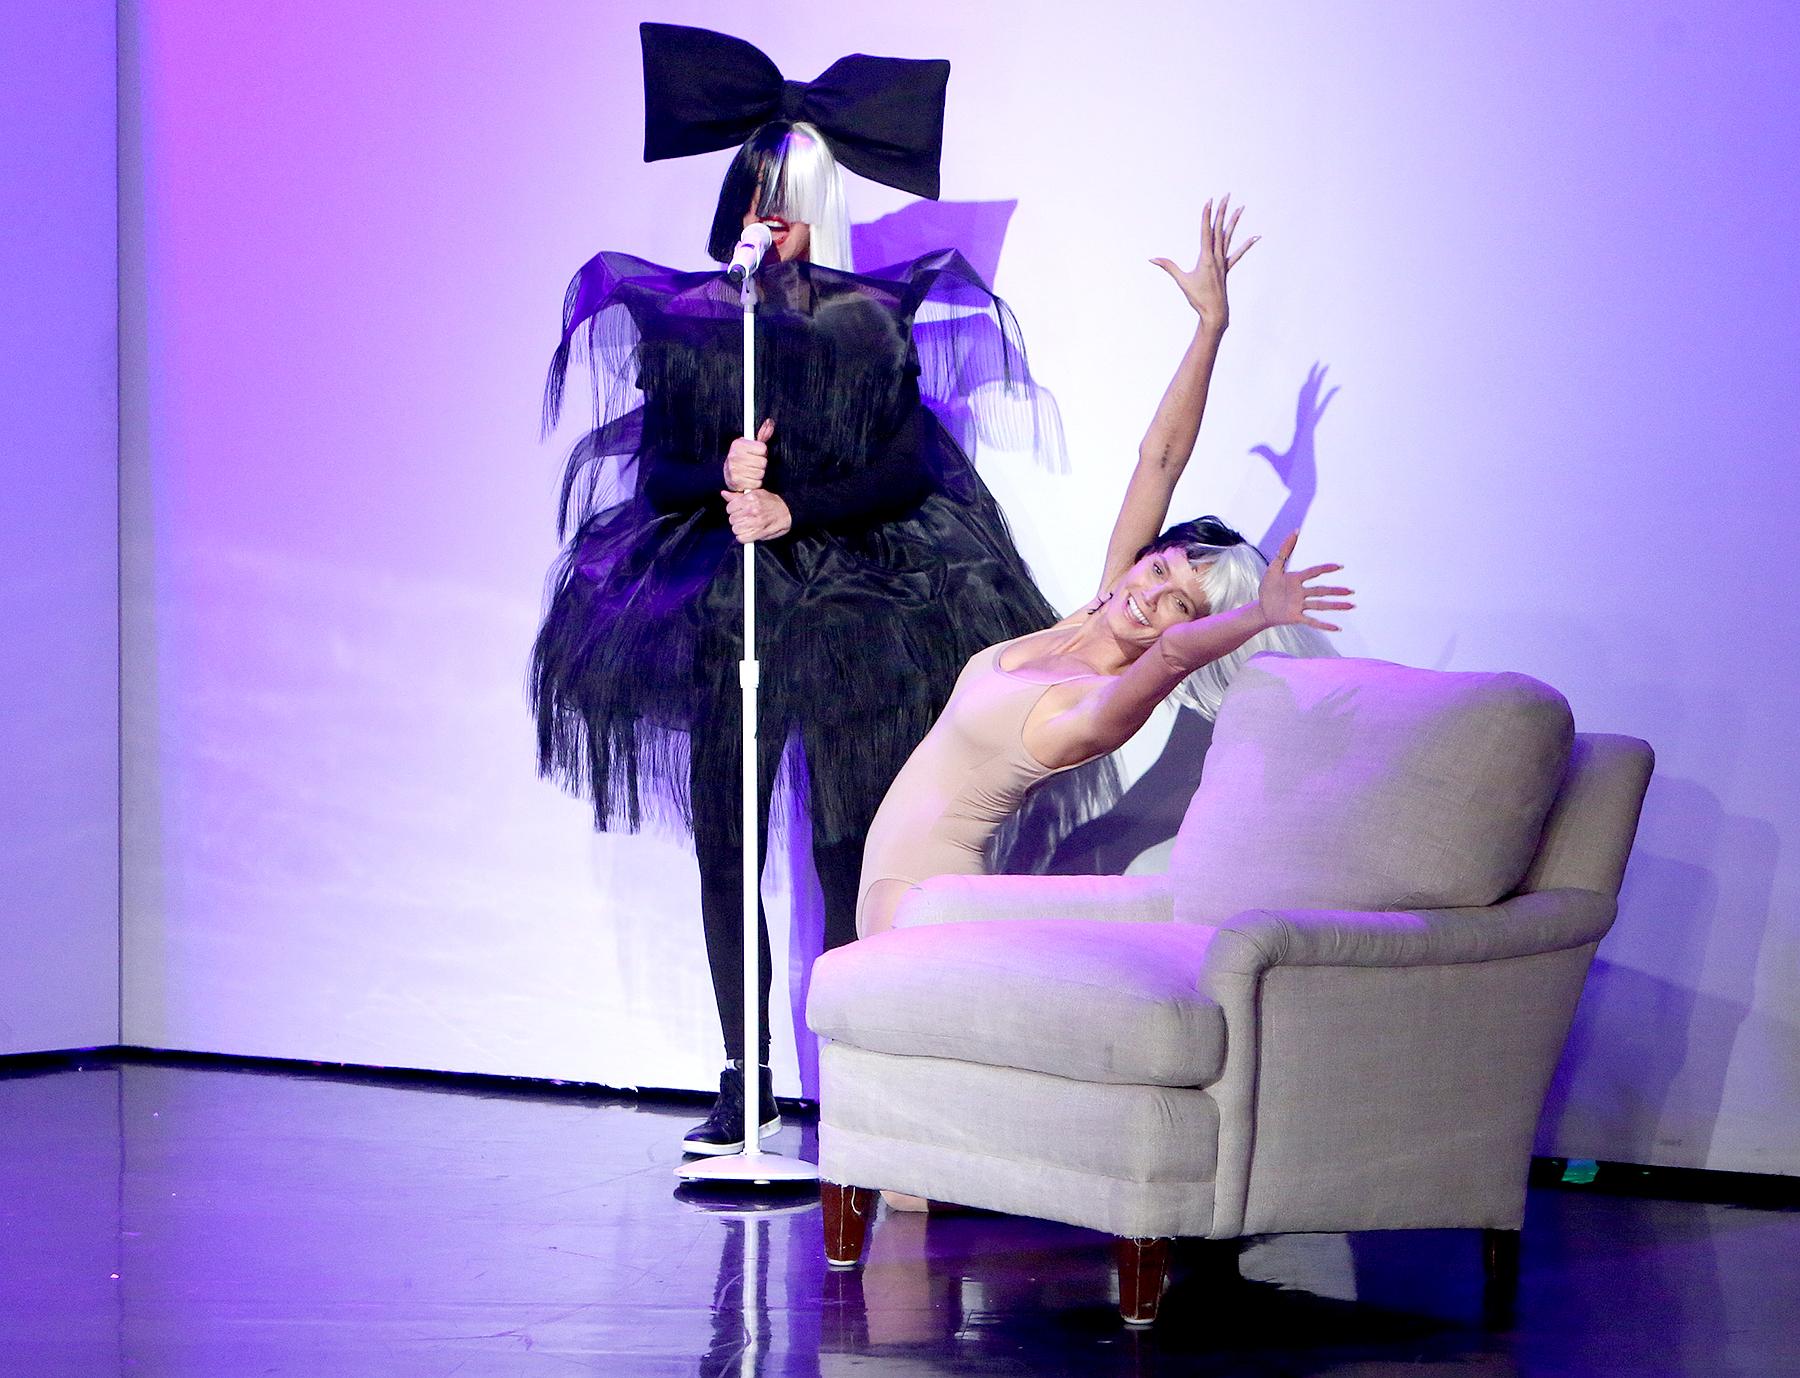 Ellen DeGeneres and Heidi Klum dressed up as Sia and Maddie Ziegler.